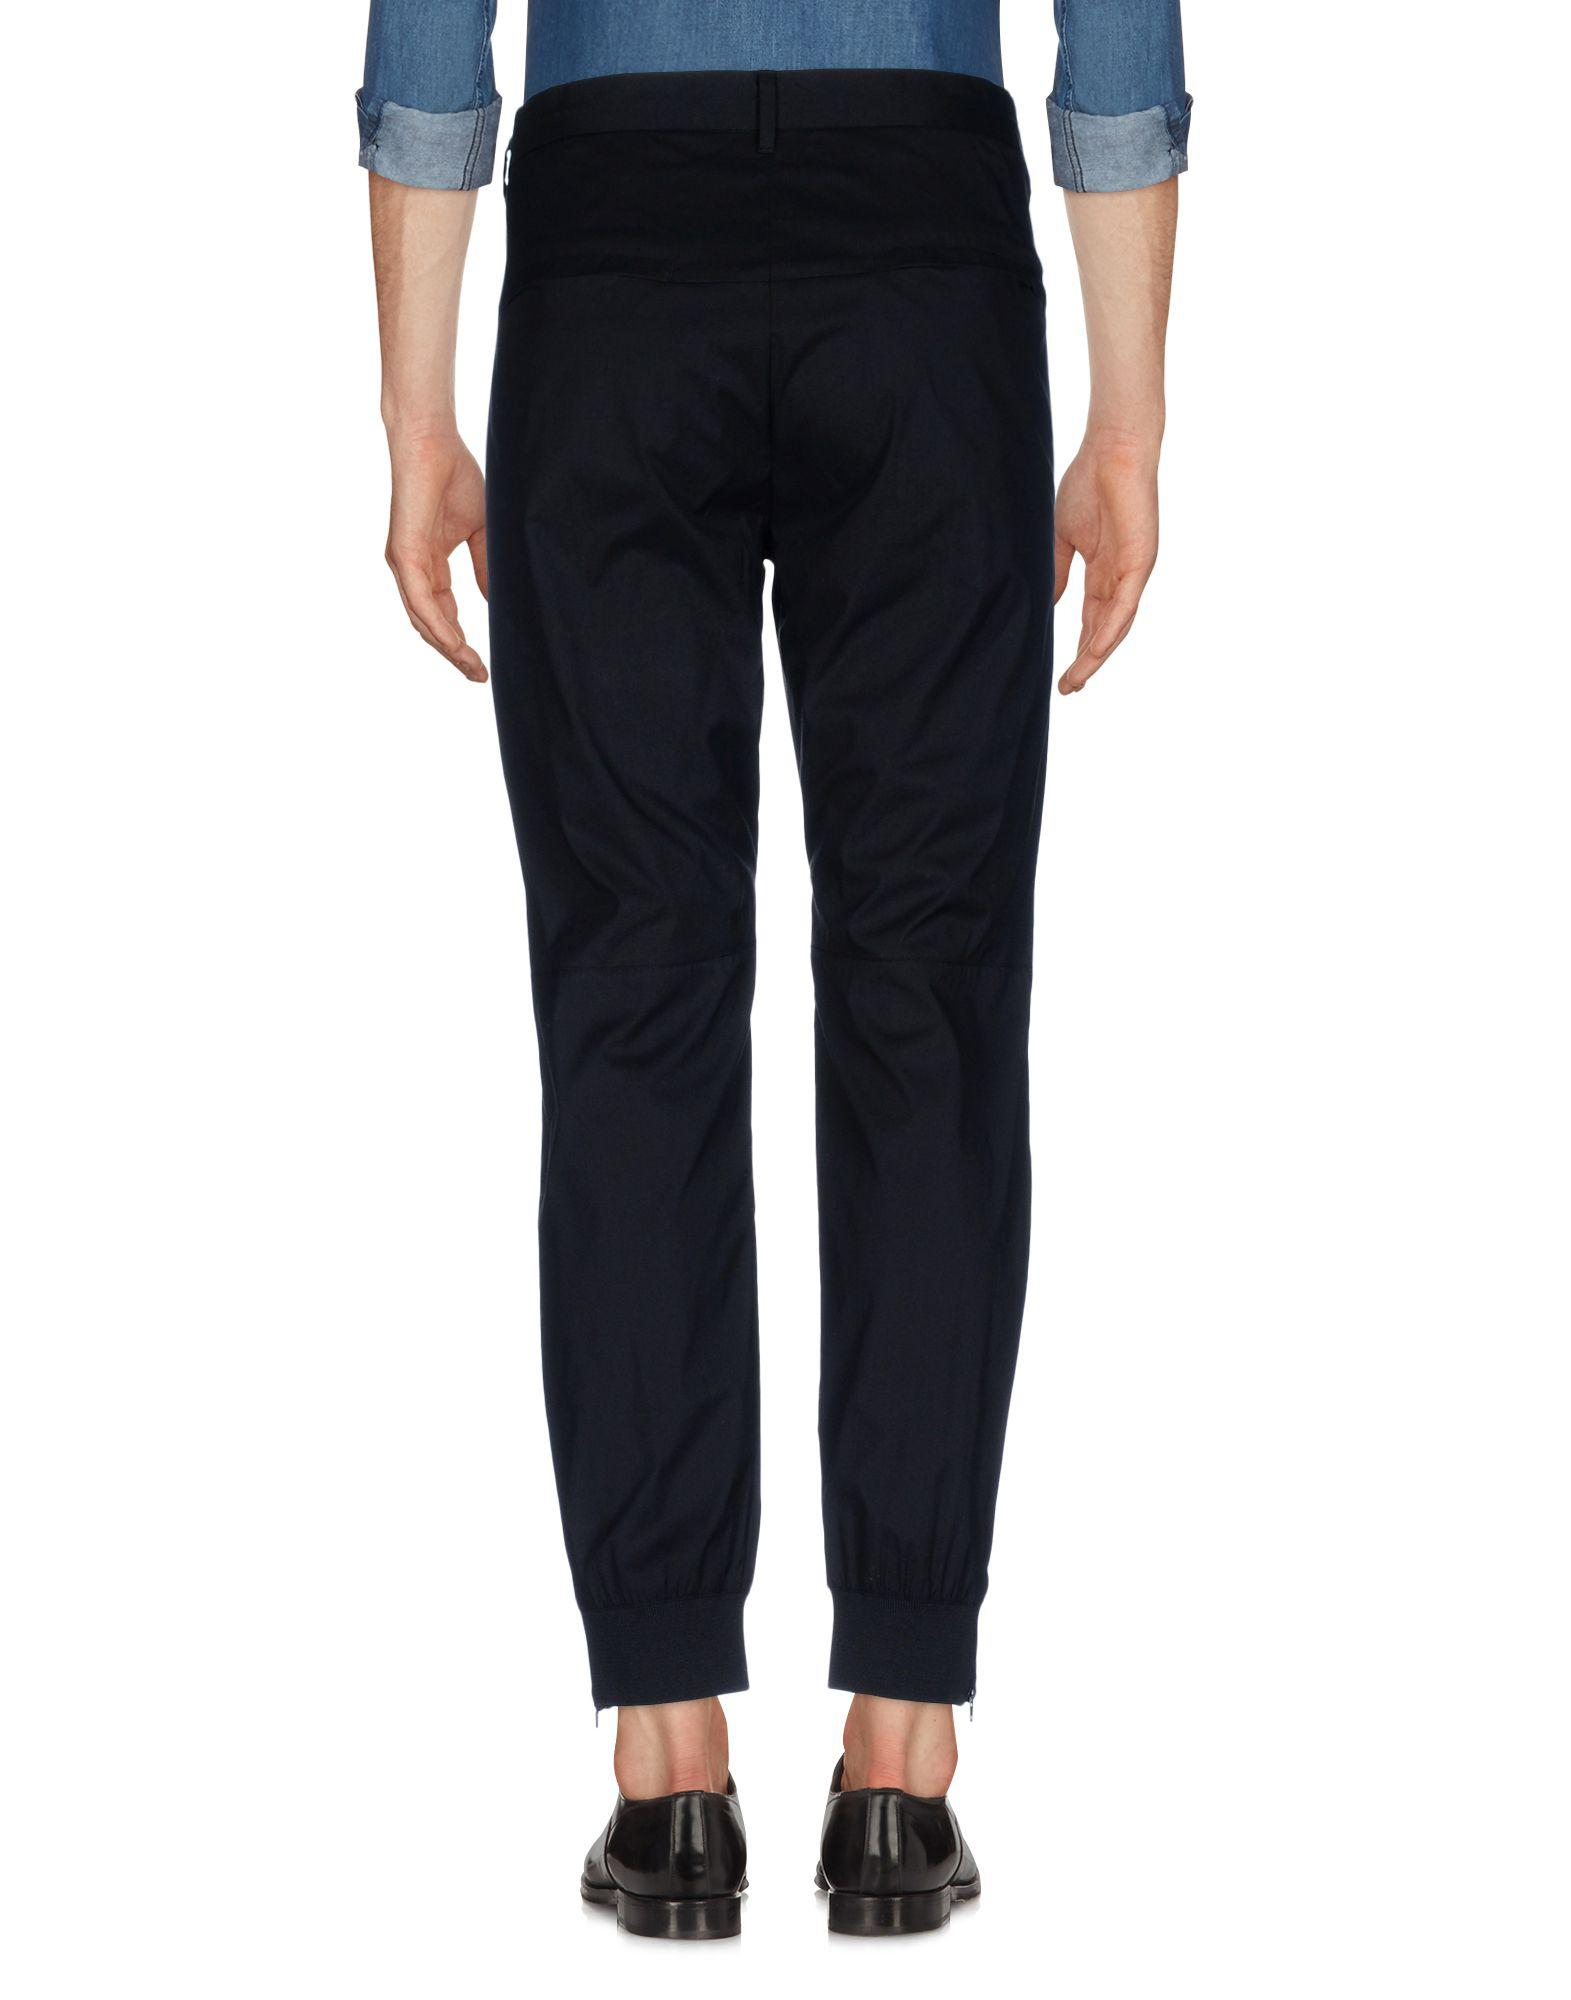 Peak Performance Cotton Casual Trouser in Black for Men